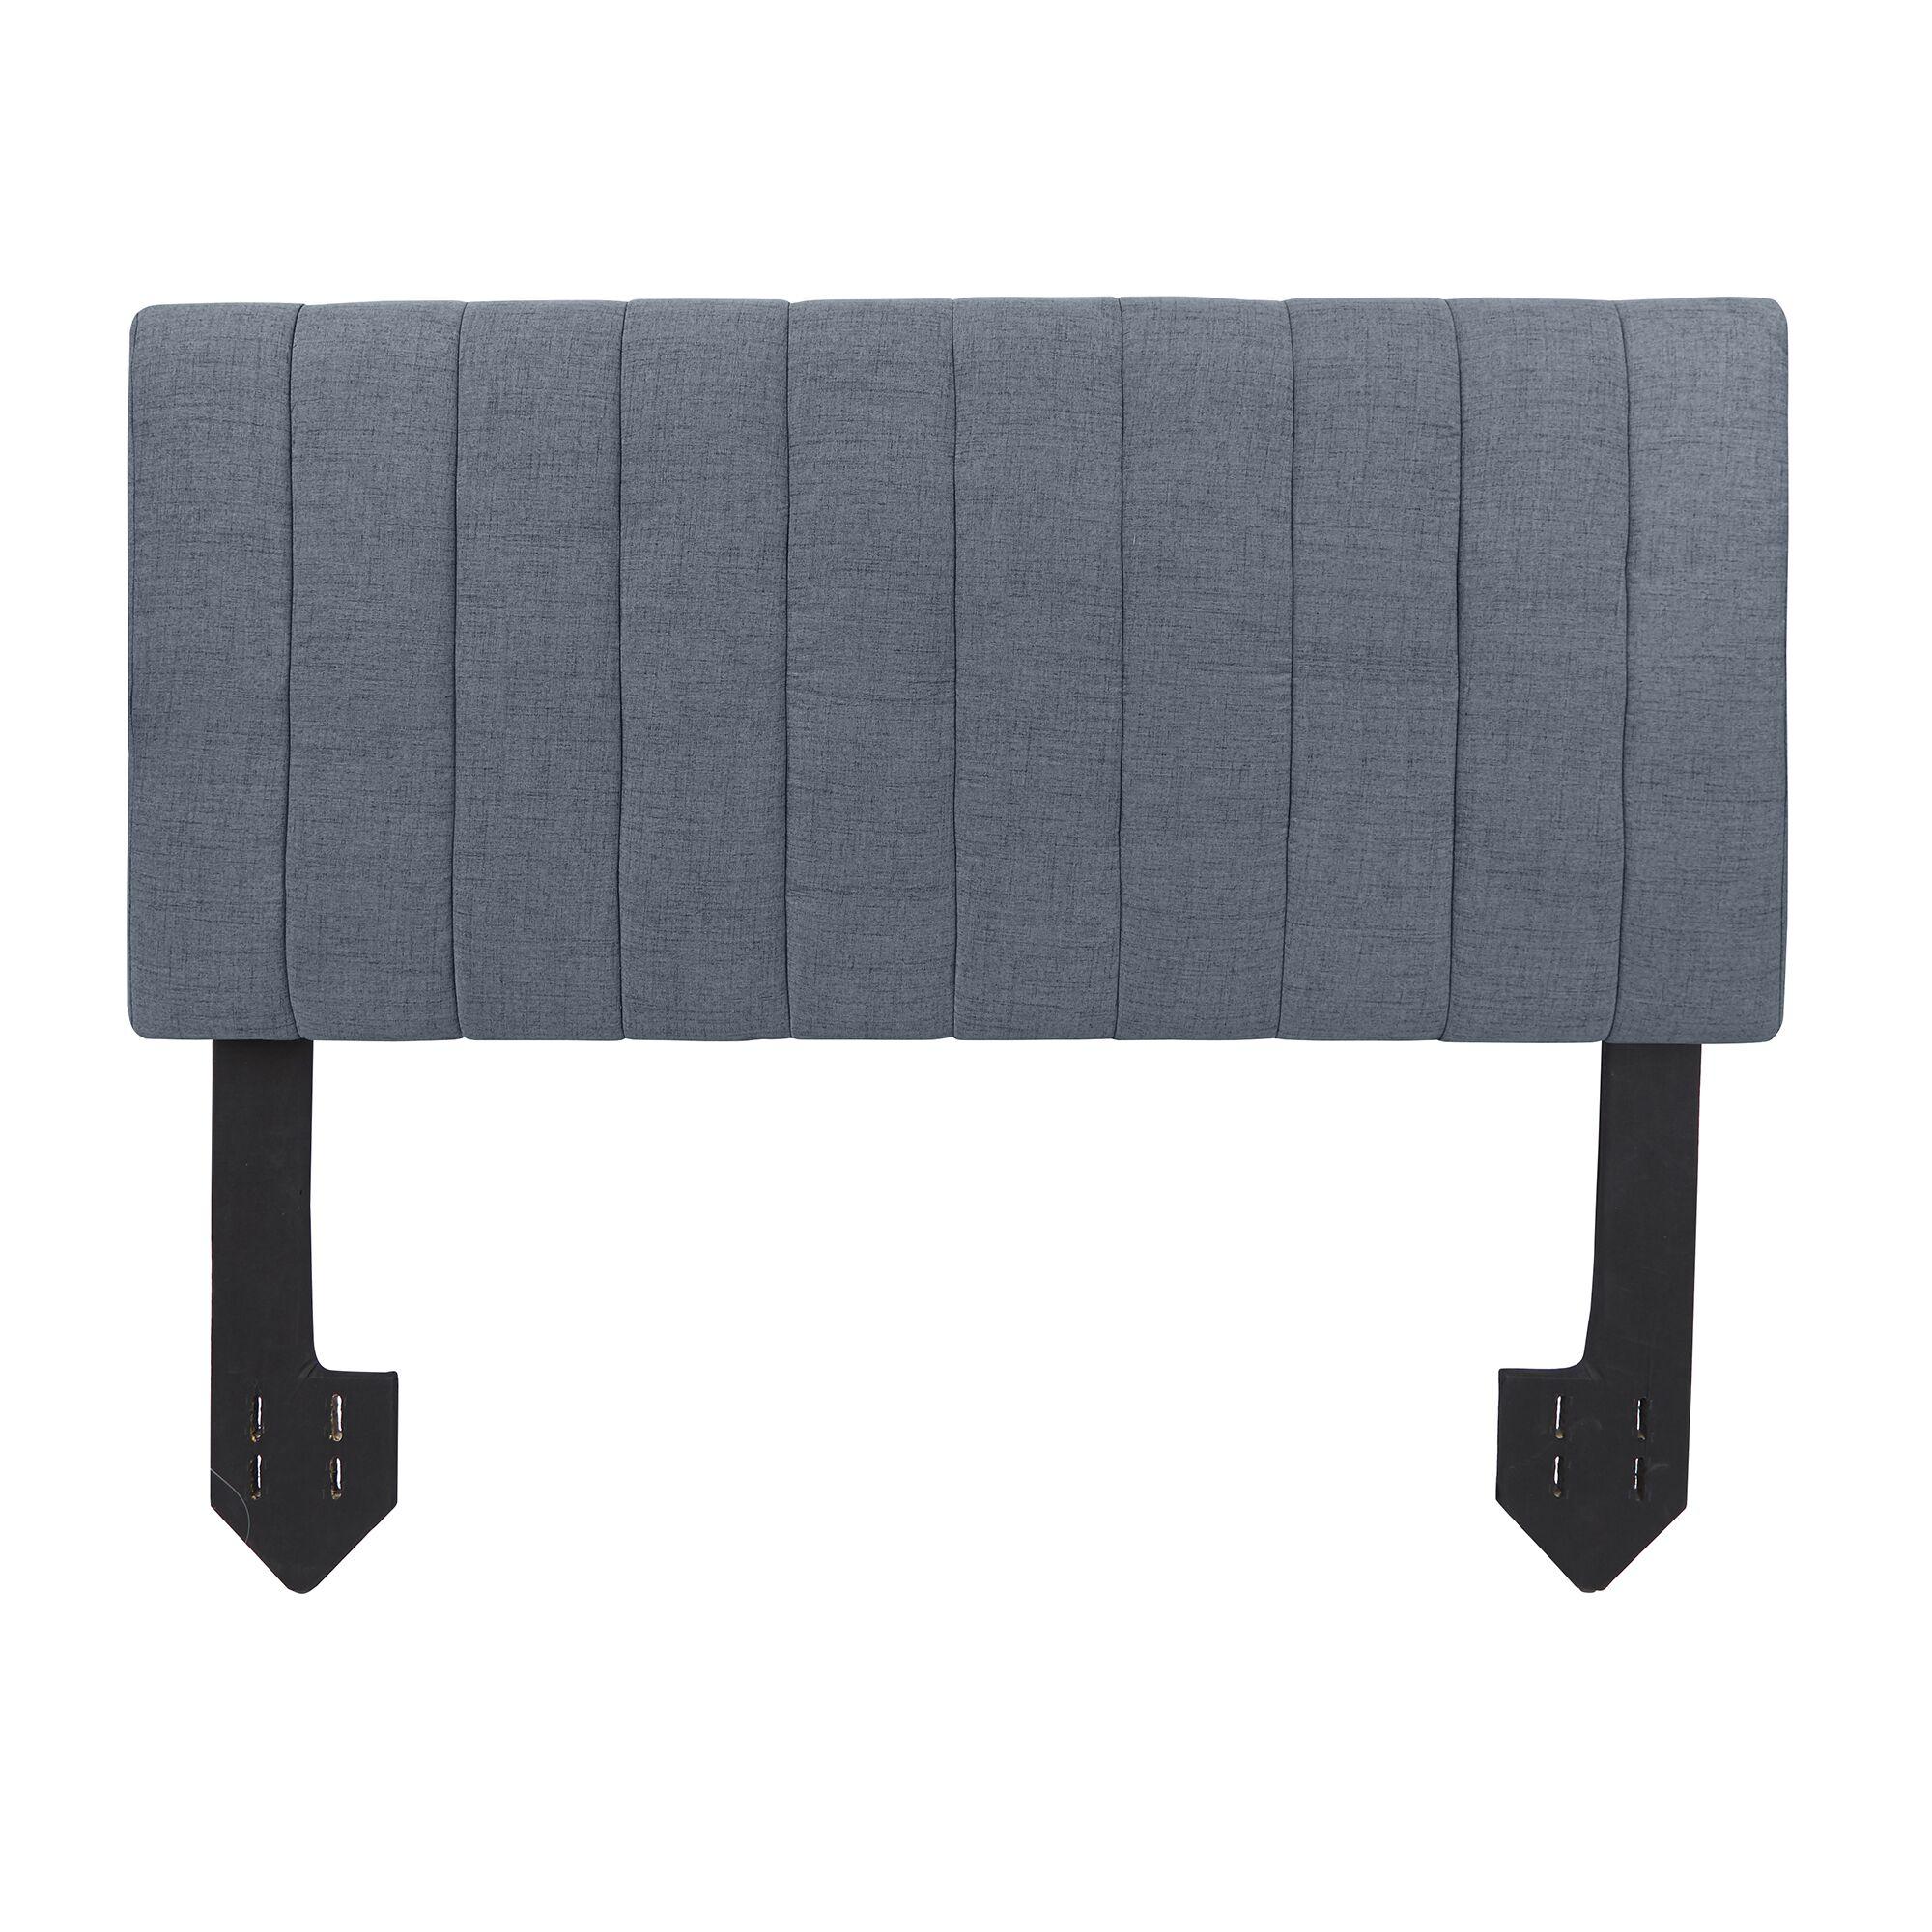 Hofstetter Tufted Powered Upholstered Panel Headboard Upholstery: Dark Gray, Size: Queen